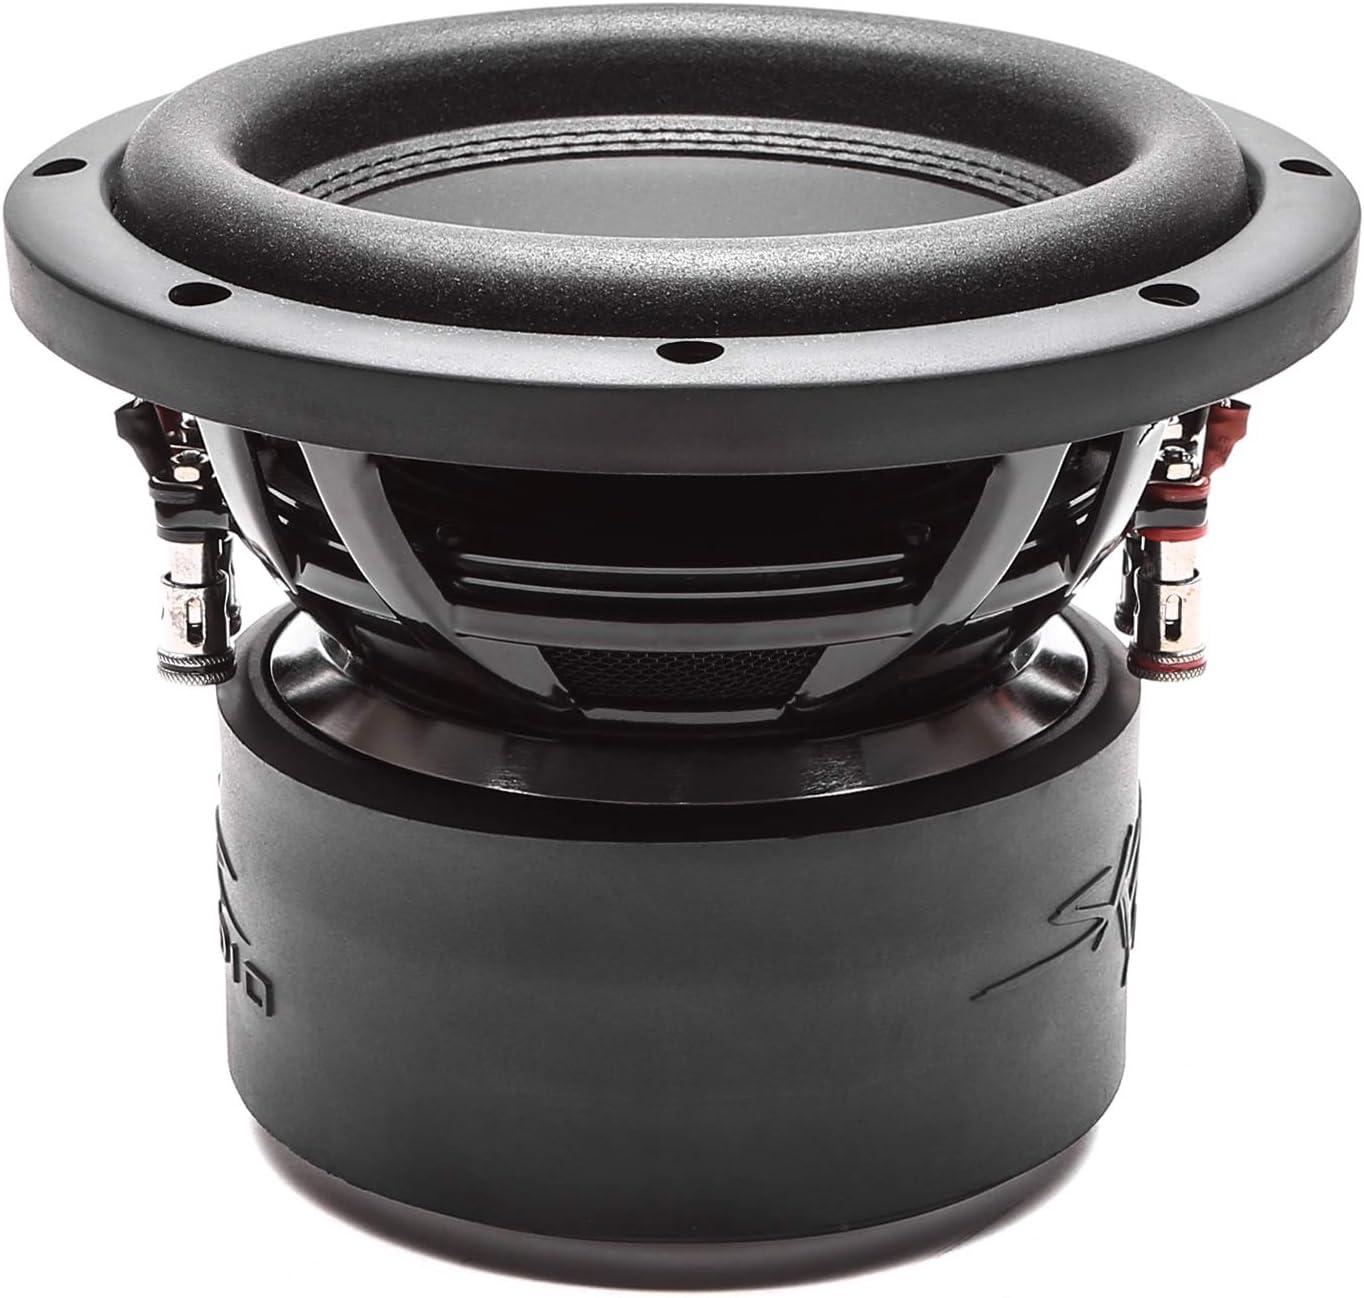 Skar Audio VVX-8v3 D4 8 800 Watt Max Power Dual 4 Ohm Car Subwoofer